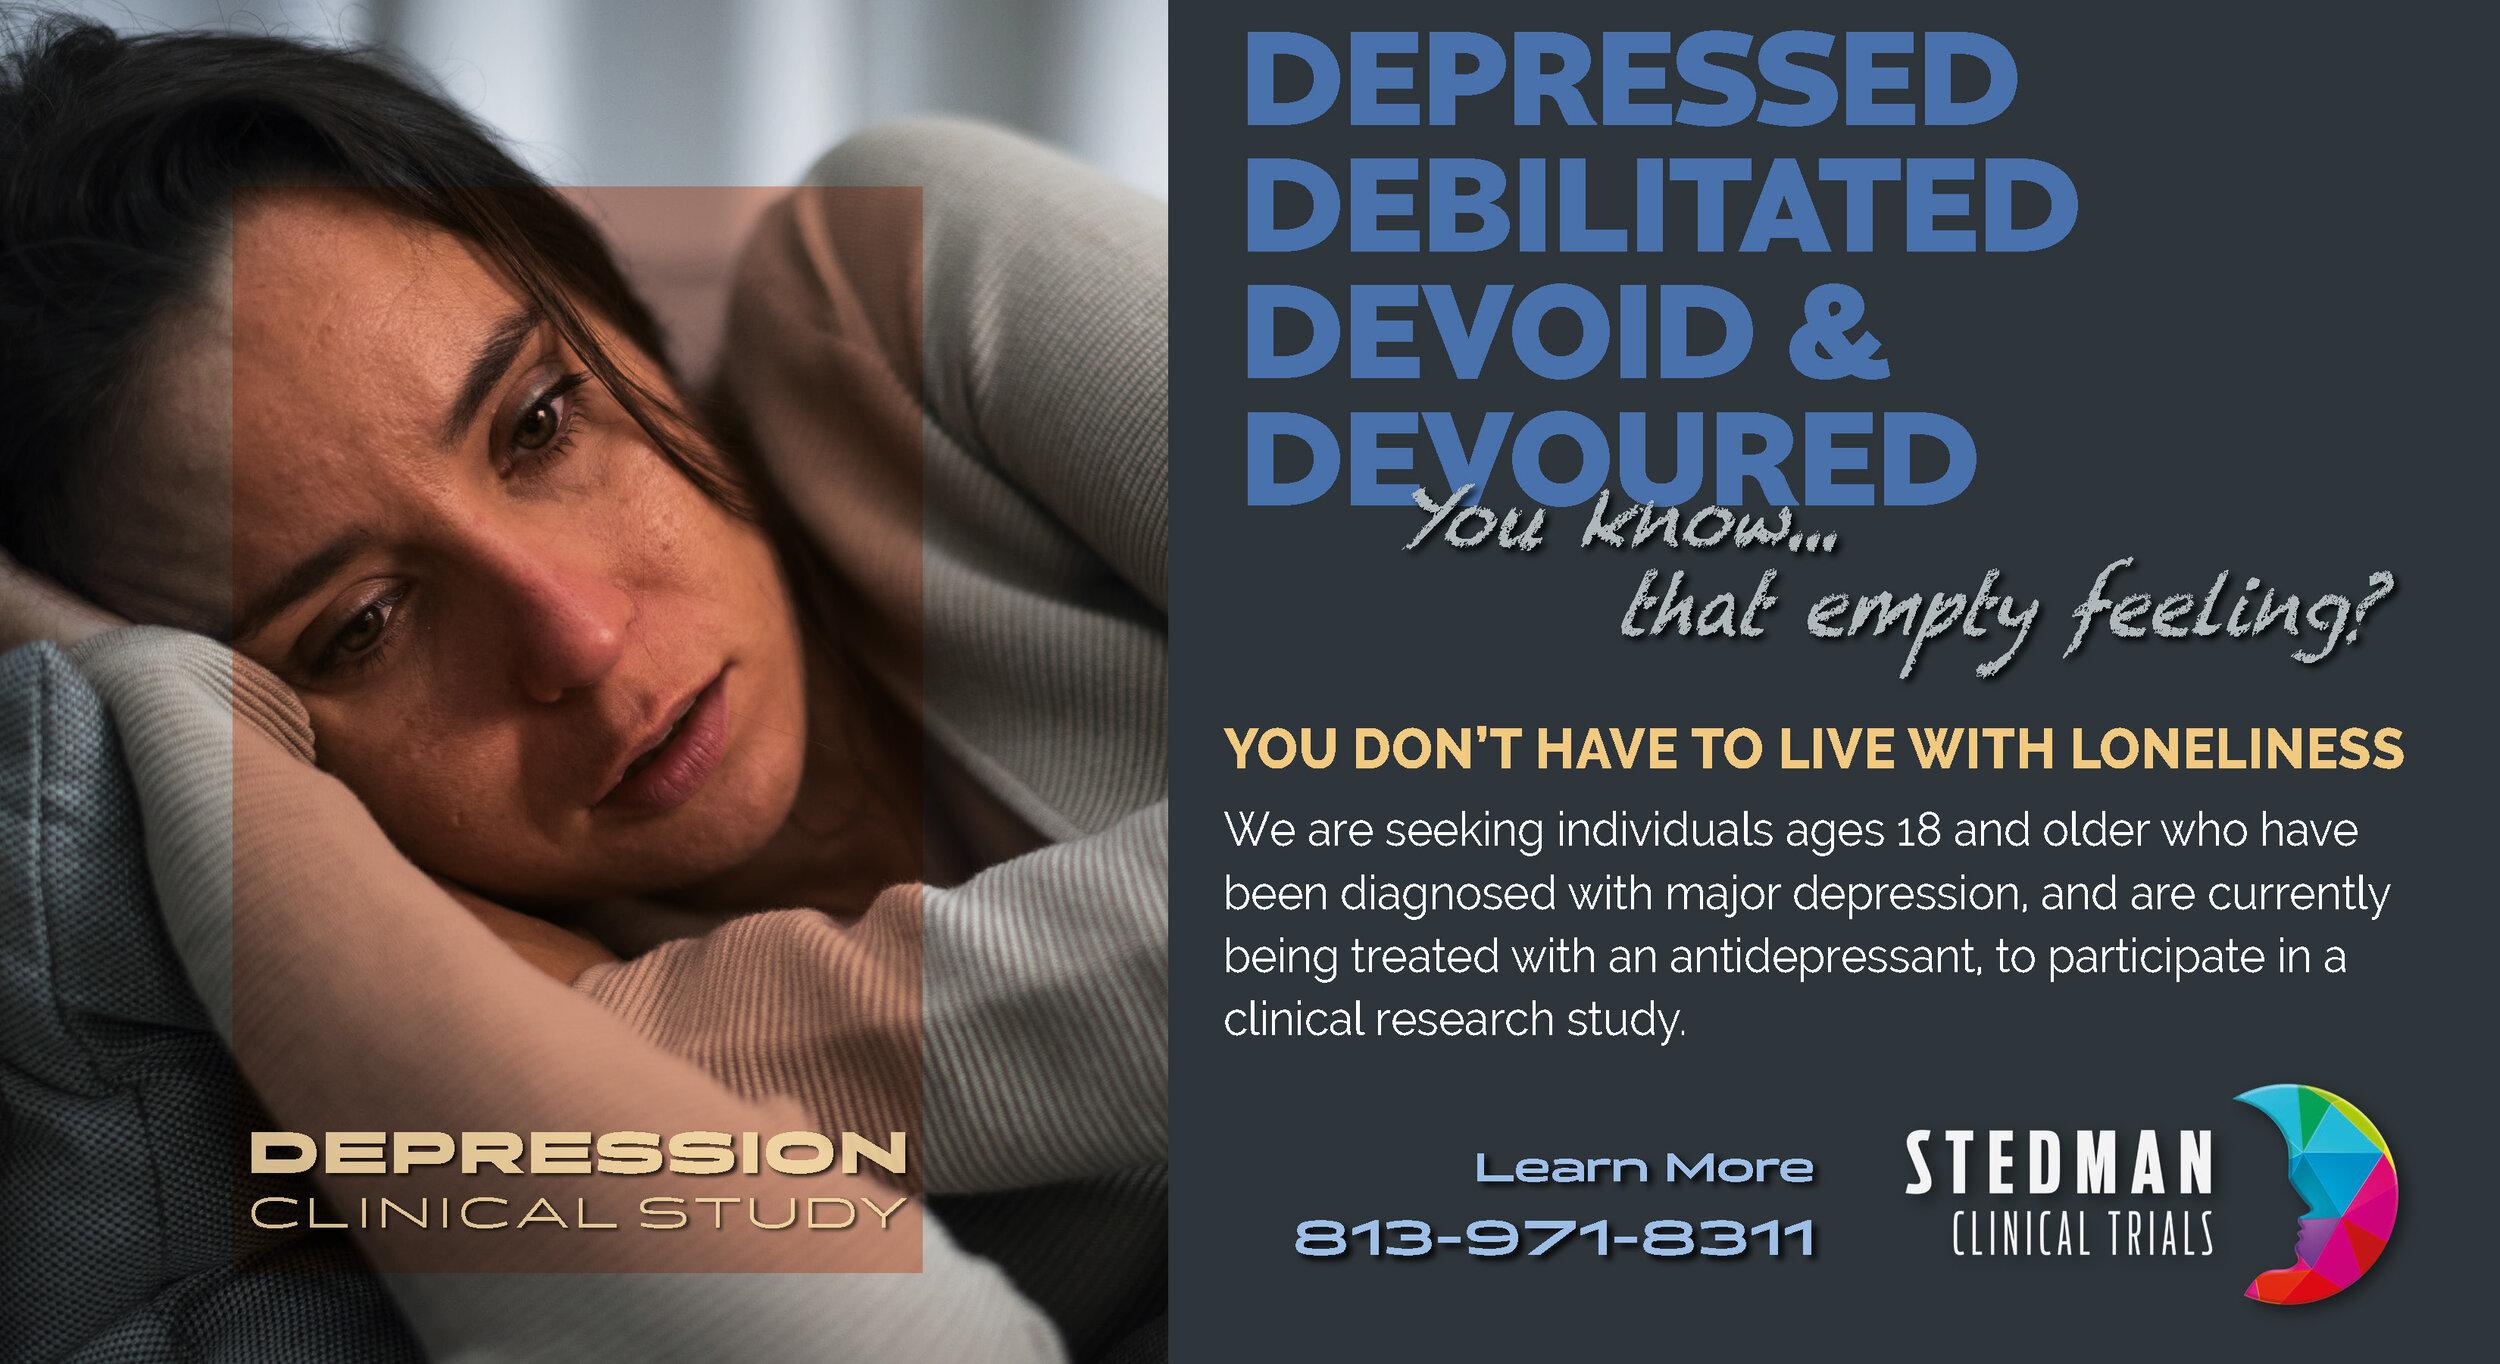 Major Depression Clinical Trial